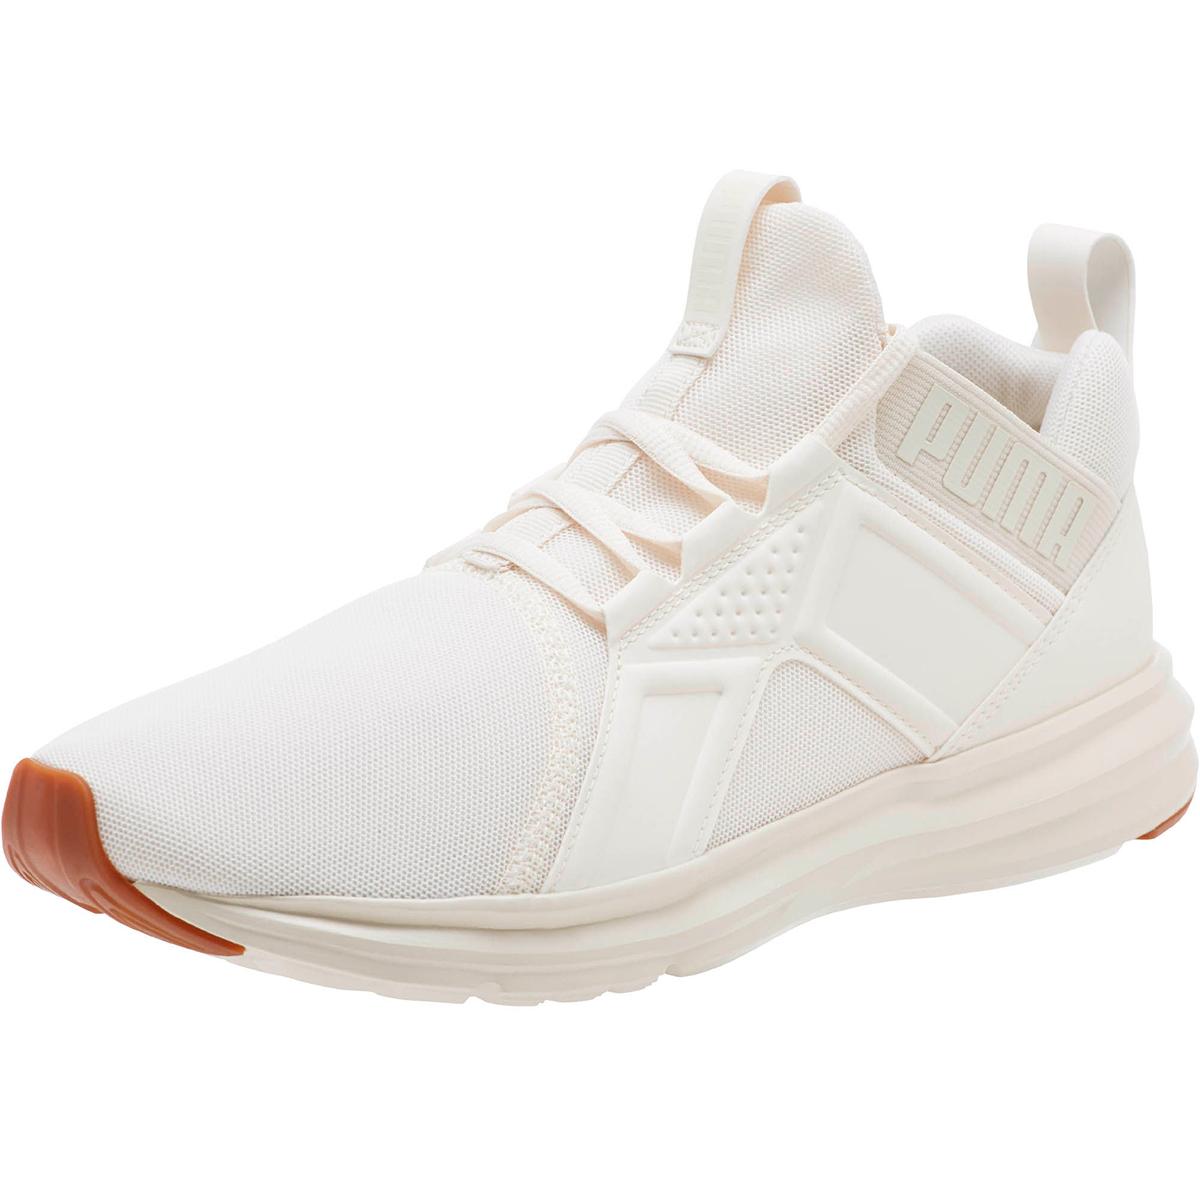 Puma Men's Enzo Running Shoes - White, 13